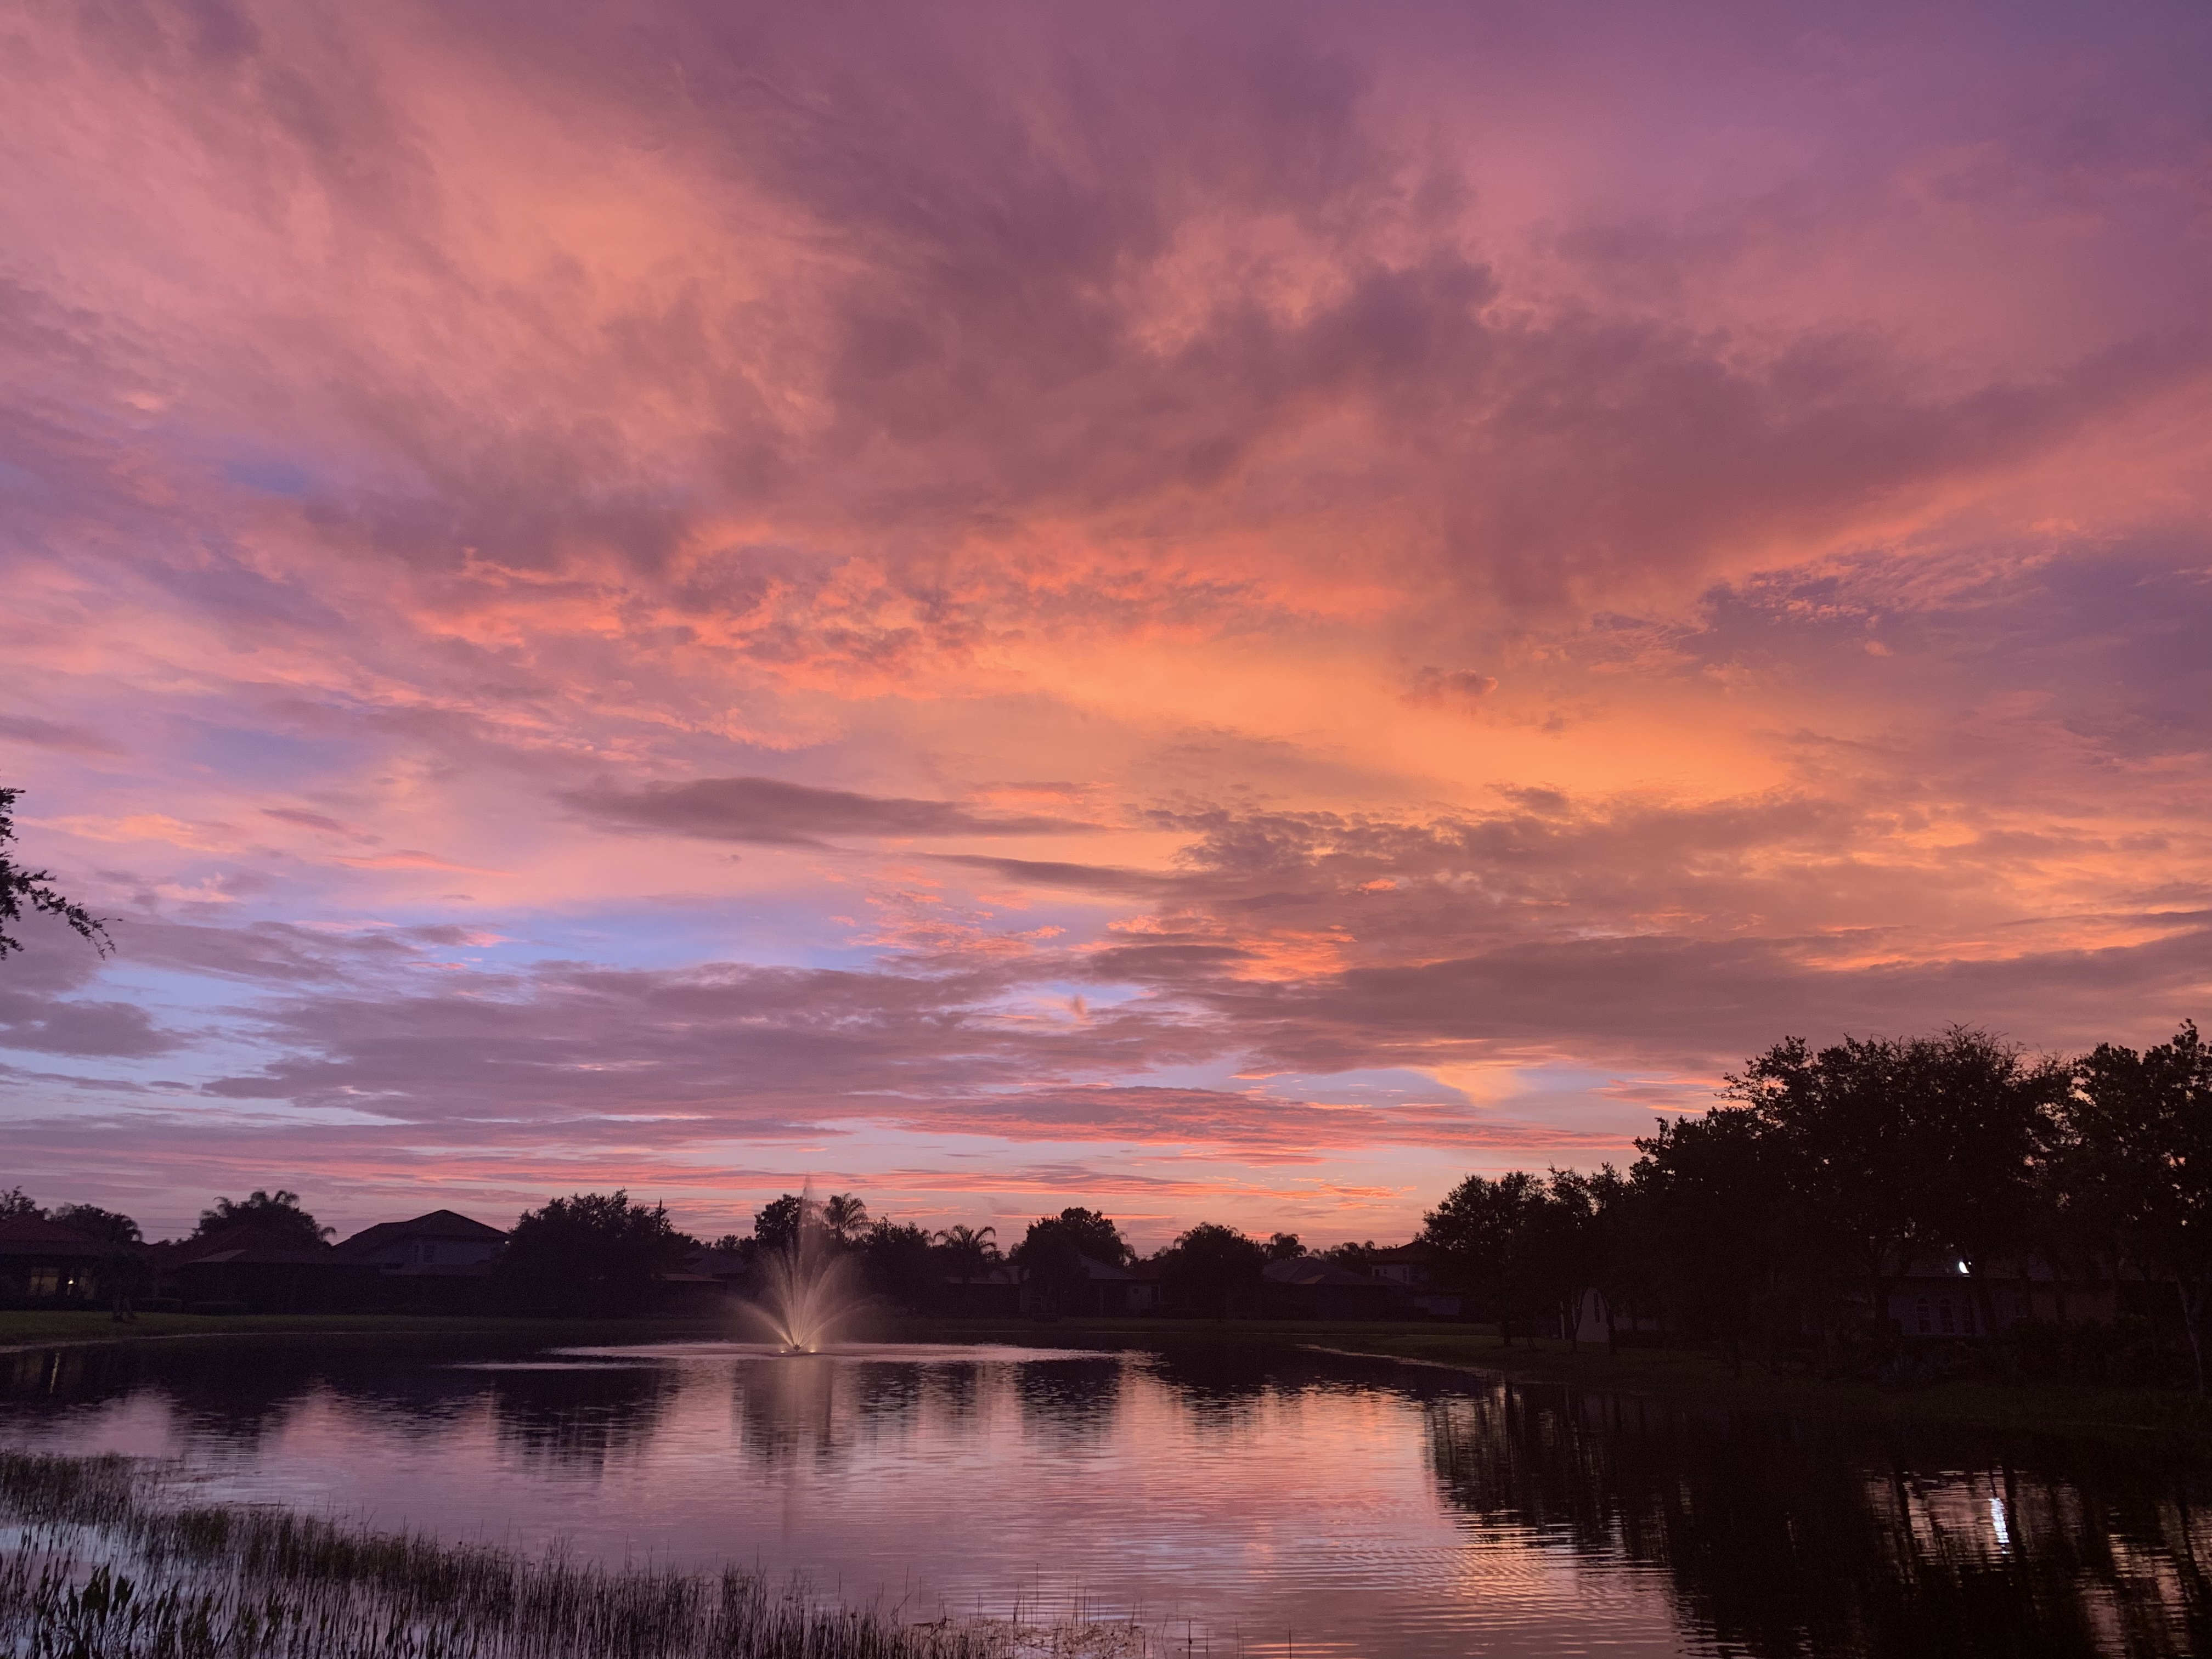 Tom-Agnew_Sunset-at-Grandezza